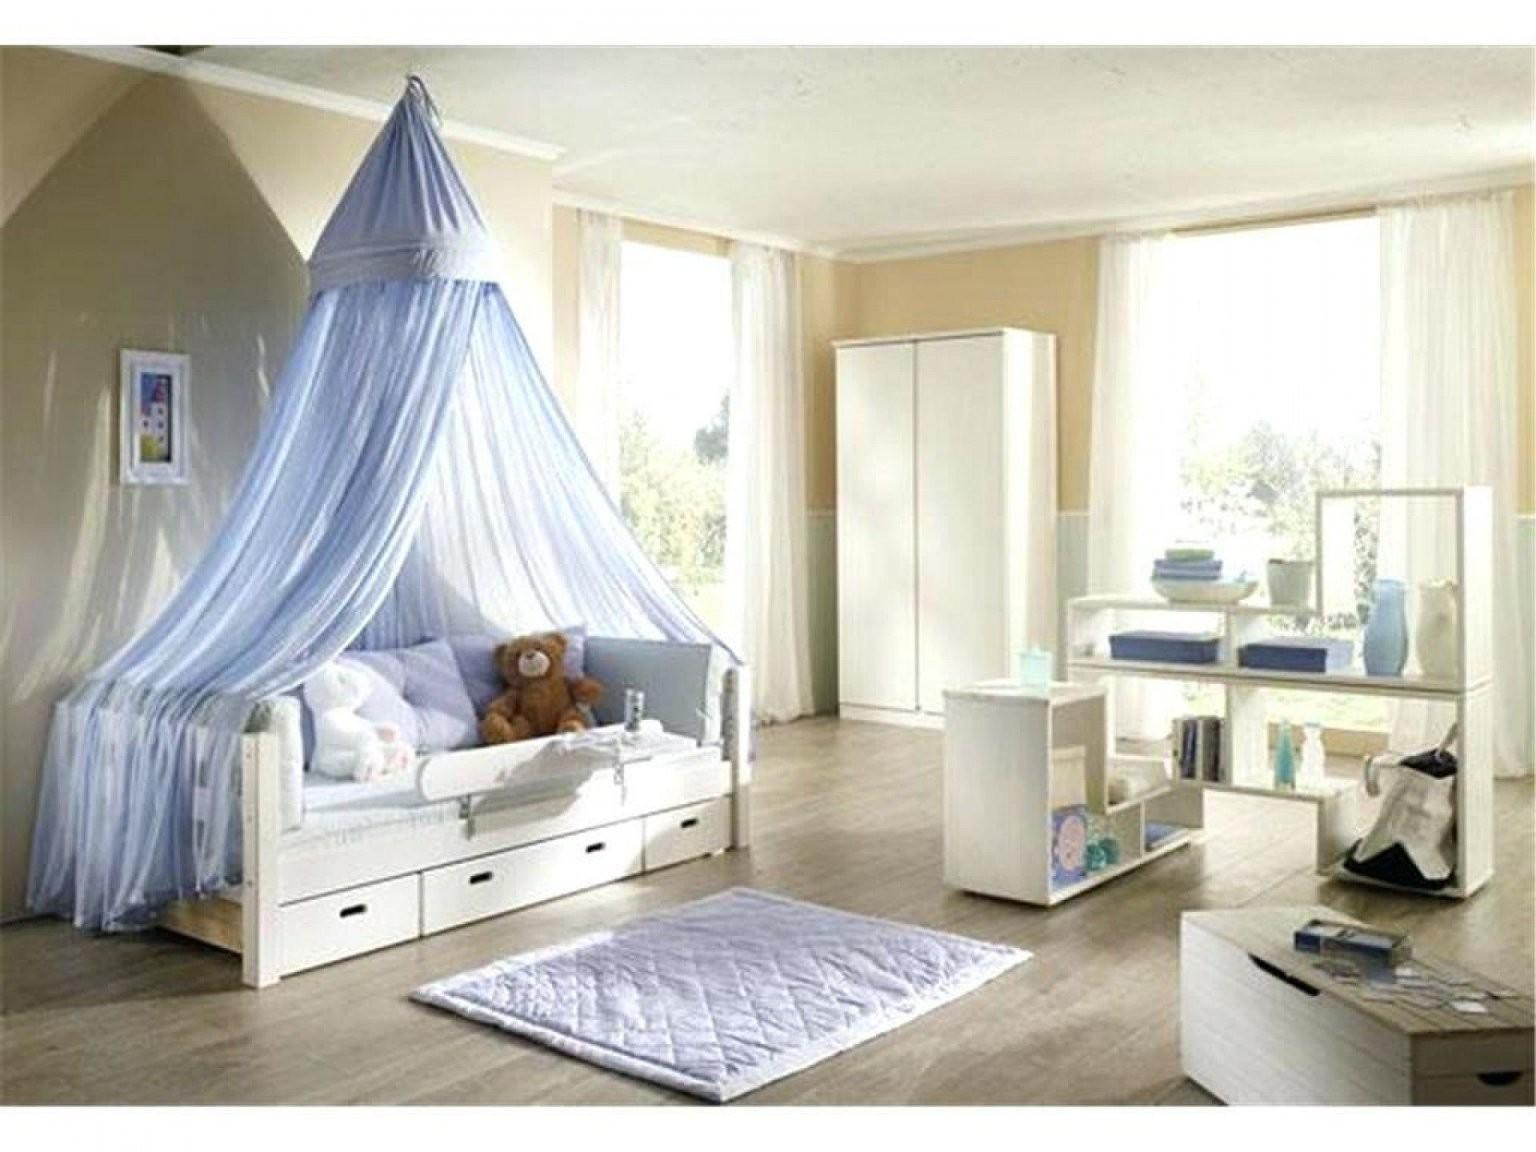 015 Himmel Fc3Bcr Bett Ikea Fur Babybett Affordable Bild With Fr von Himmel Für Bett Ikea Bild